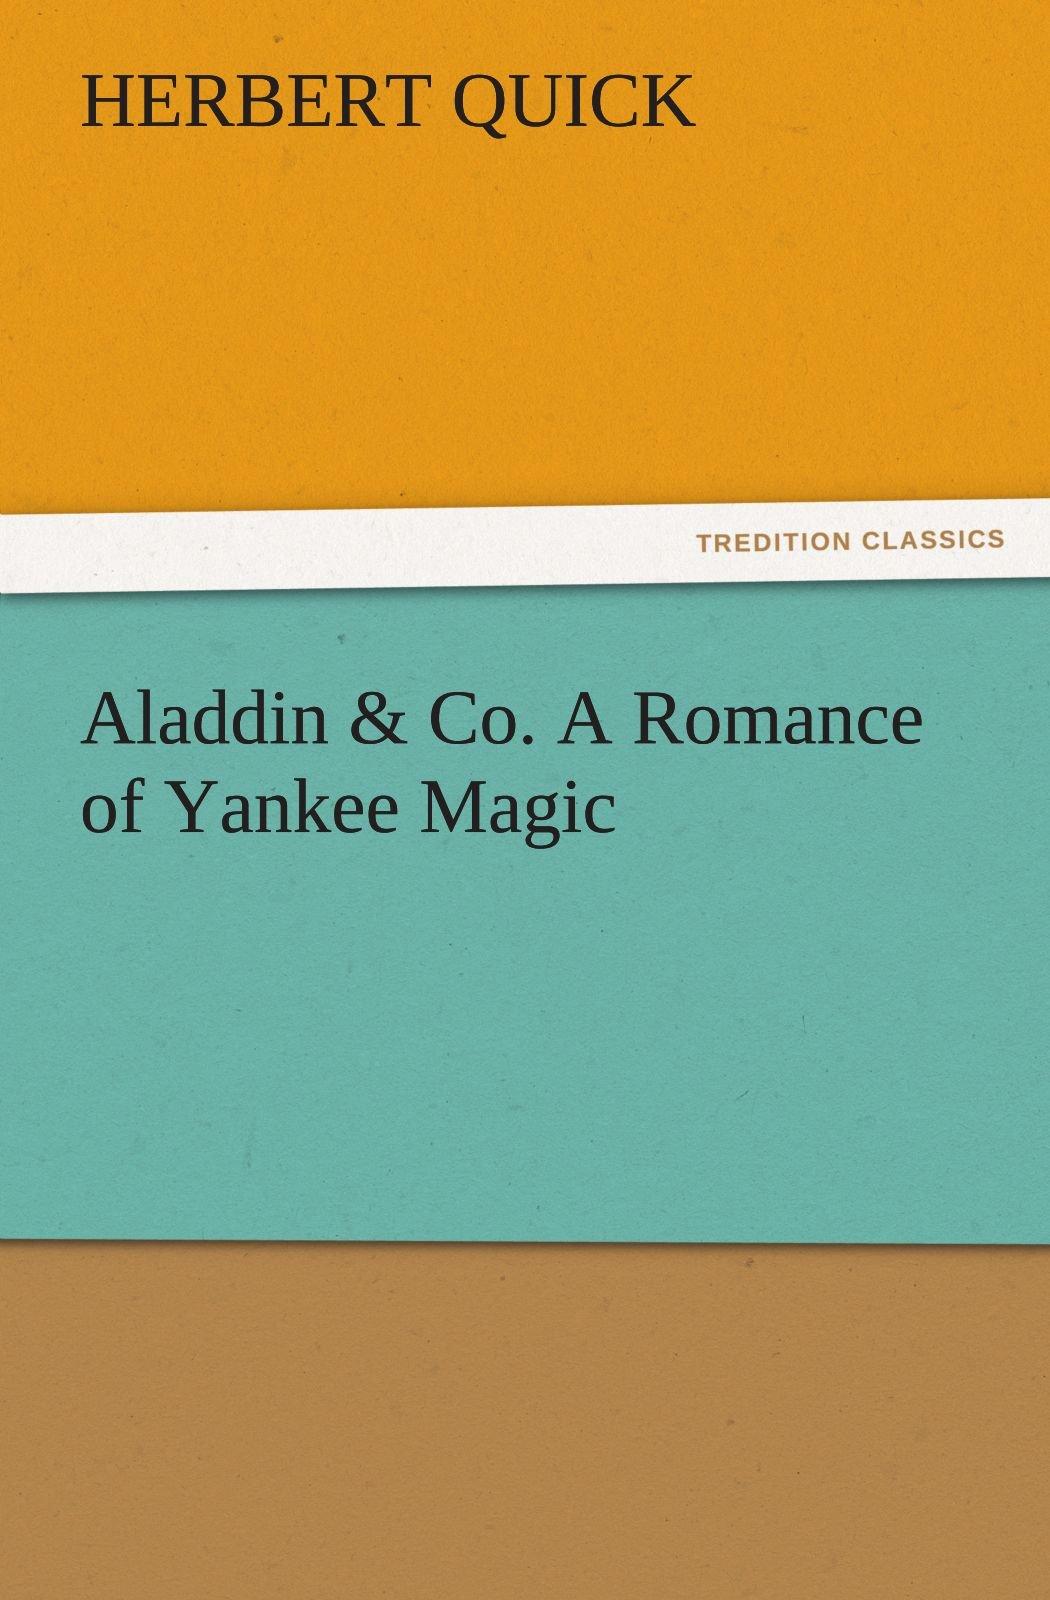 Download Aladdin & Co. A Romance of Yankee Magic (TREDITION CLASSICS) ebook